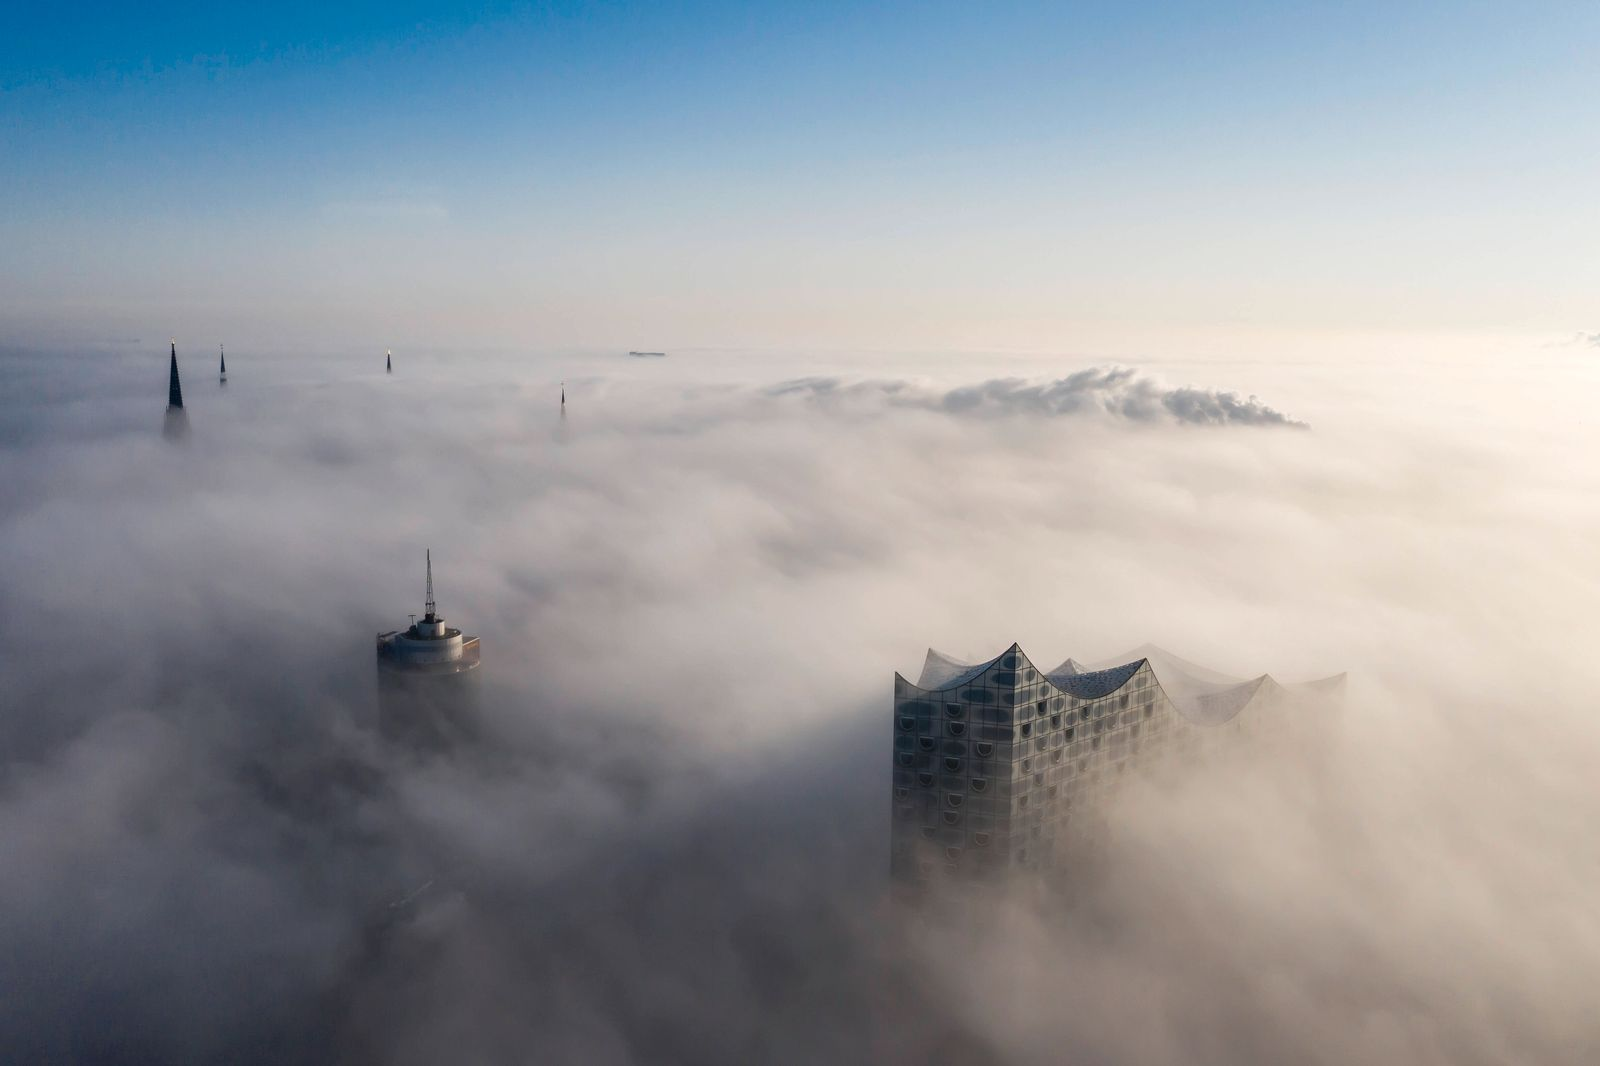 Hamburg 2021 Hamburg 2021, Photographie, Fotografie Elbphilharmonie, Elphie im Nebel Hamburg Germany JuergenxTap *** Ham